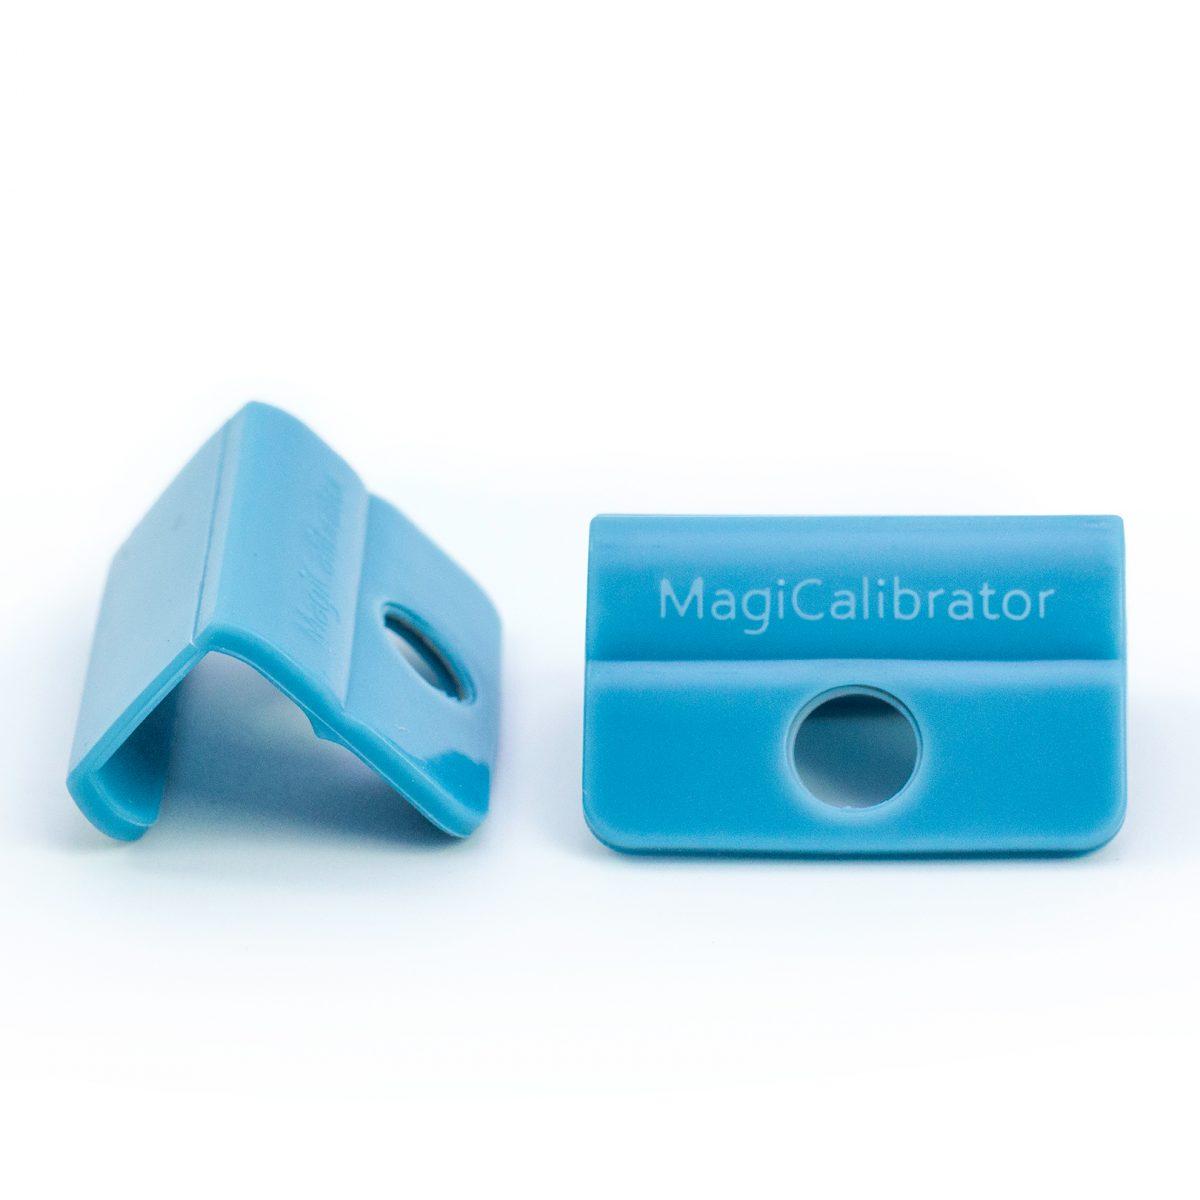 MagiCalibrator